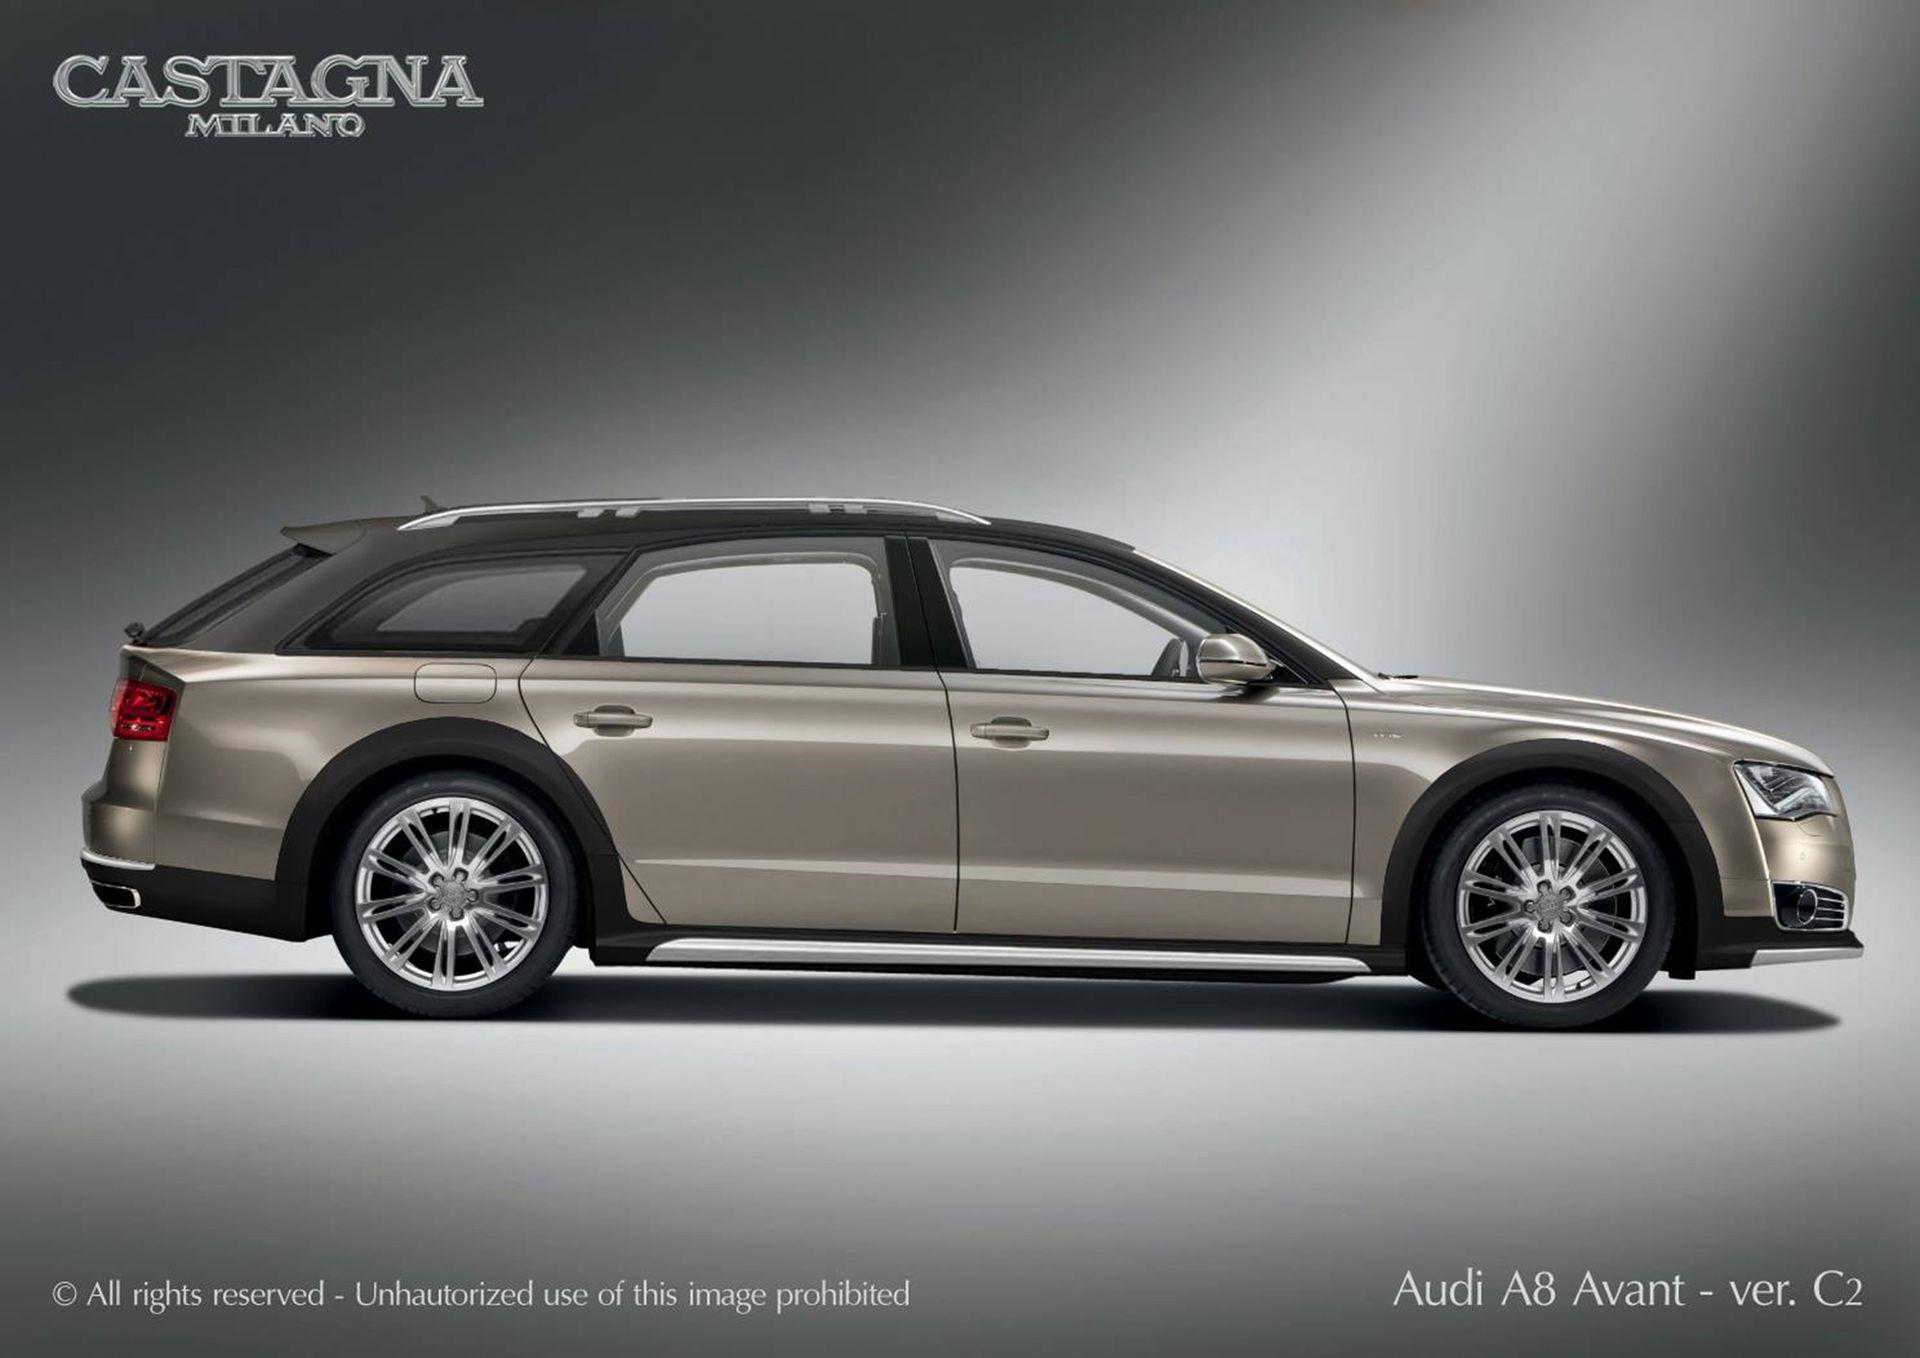 Audi A8 Avant Allroad med W12